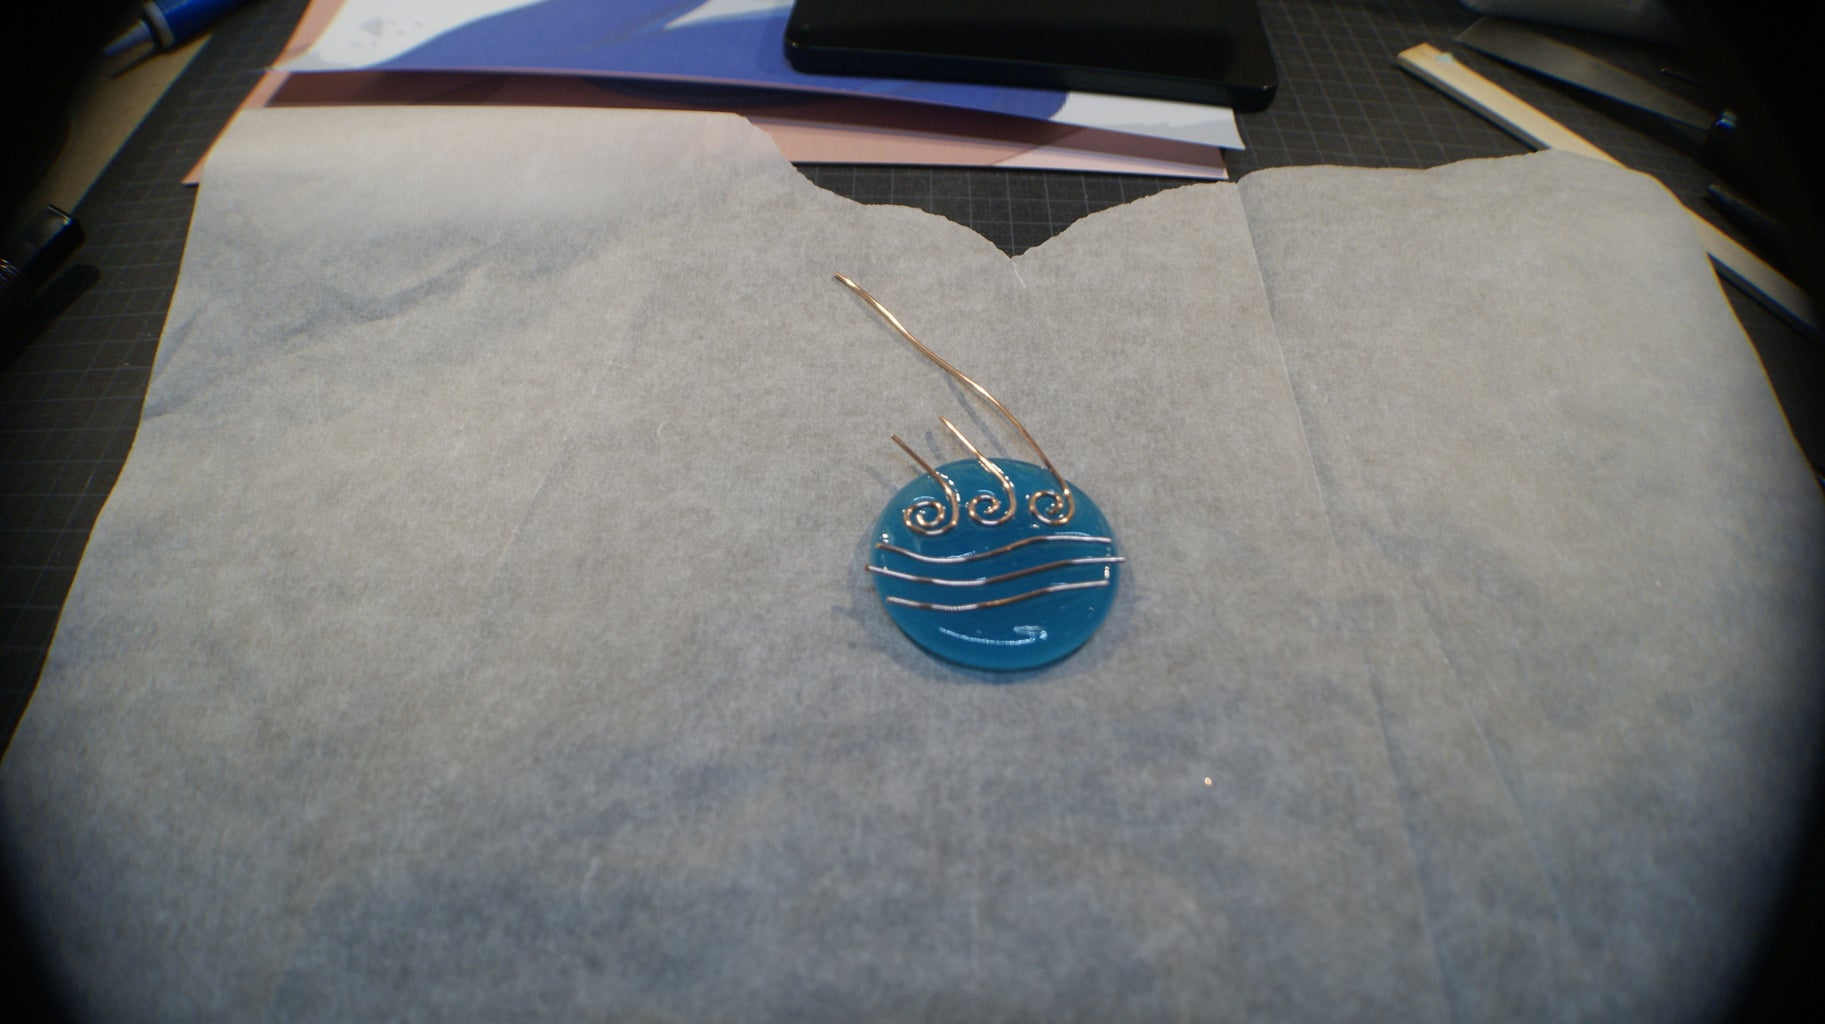 Making the Medallion